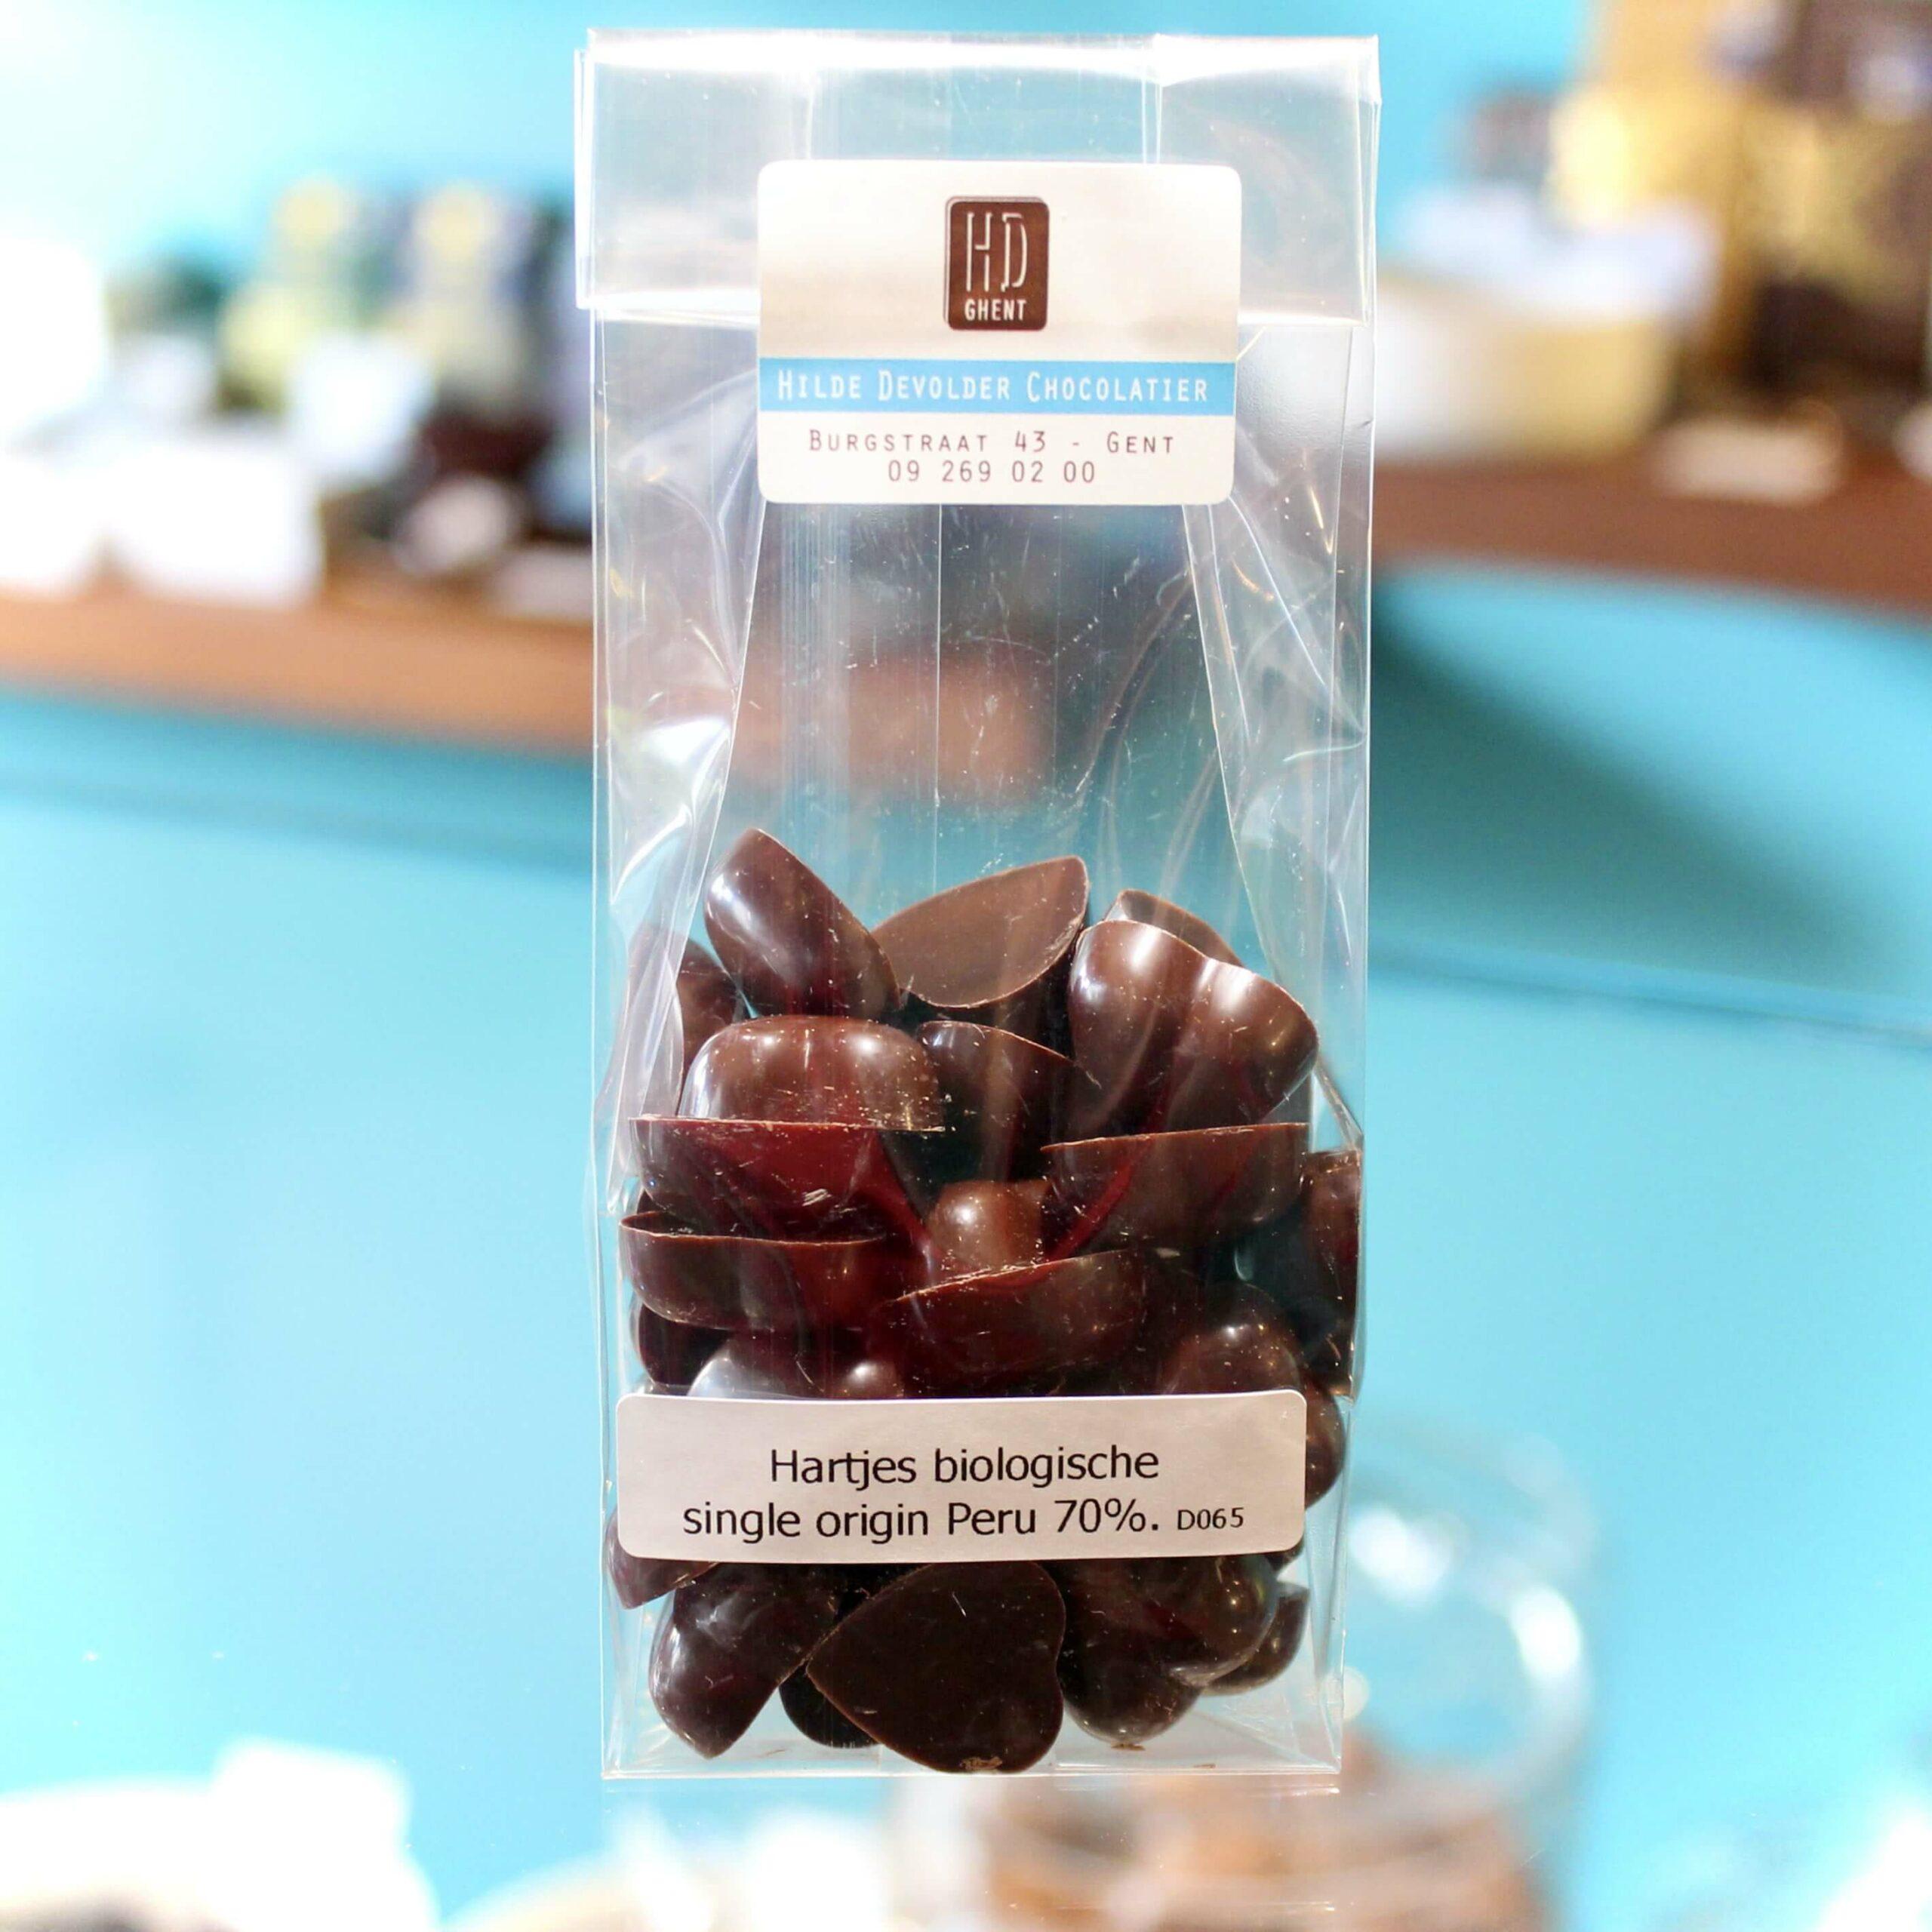 hilde devolder chocolatier hearts peru 70 organic fair trade